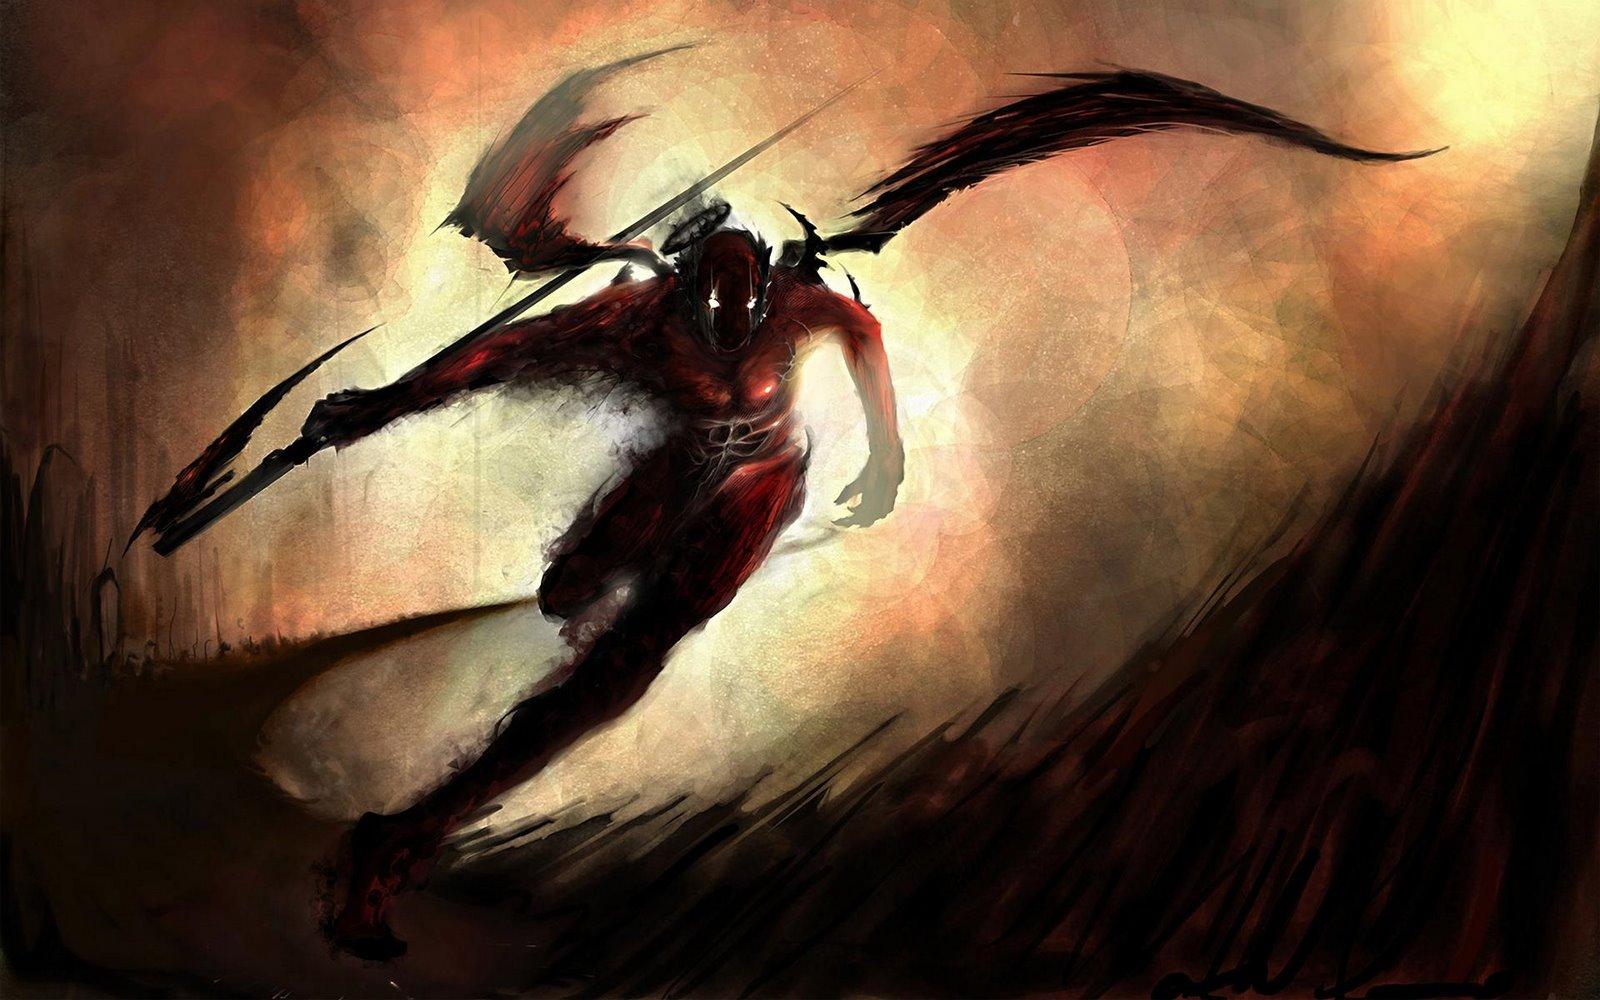 scary image of angel - photo #13